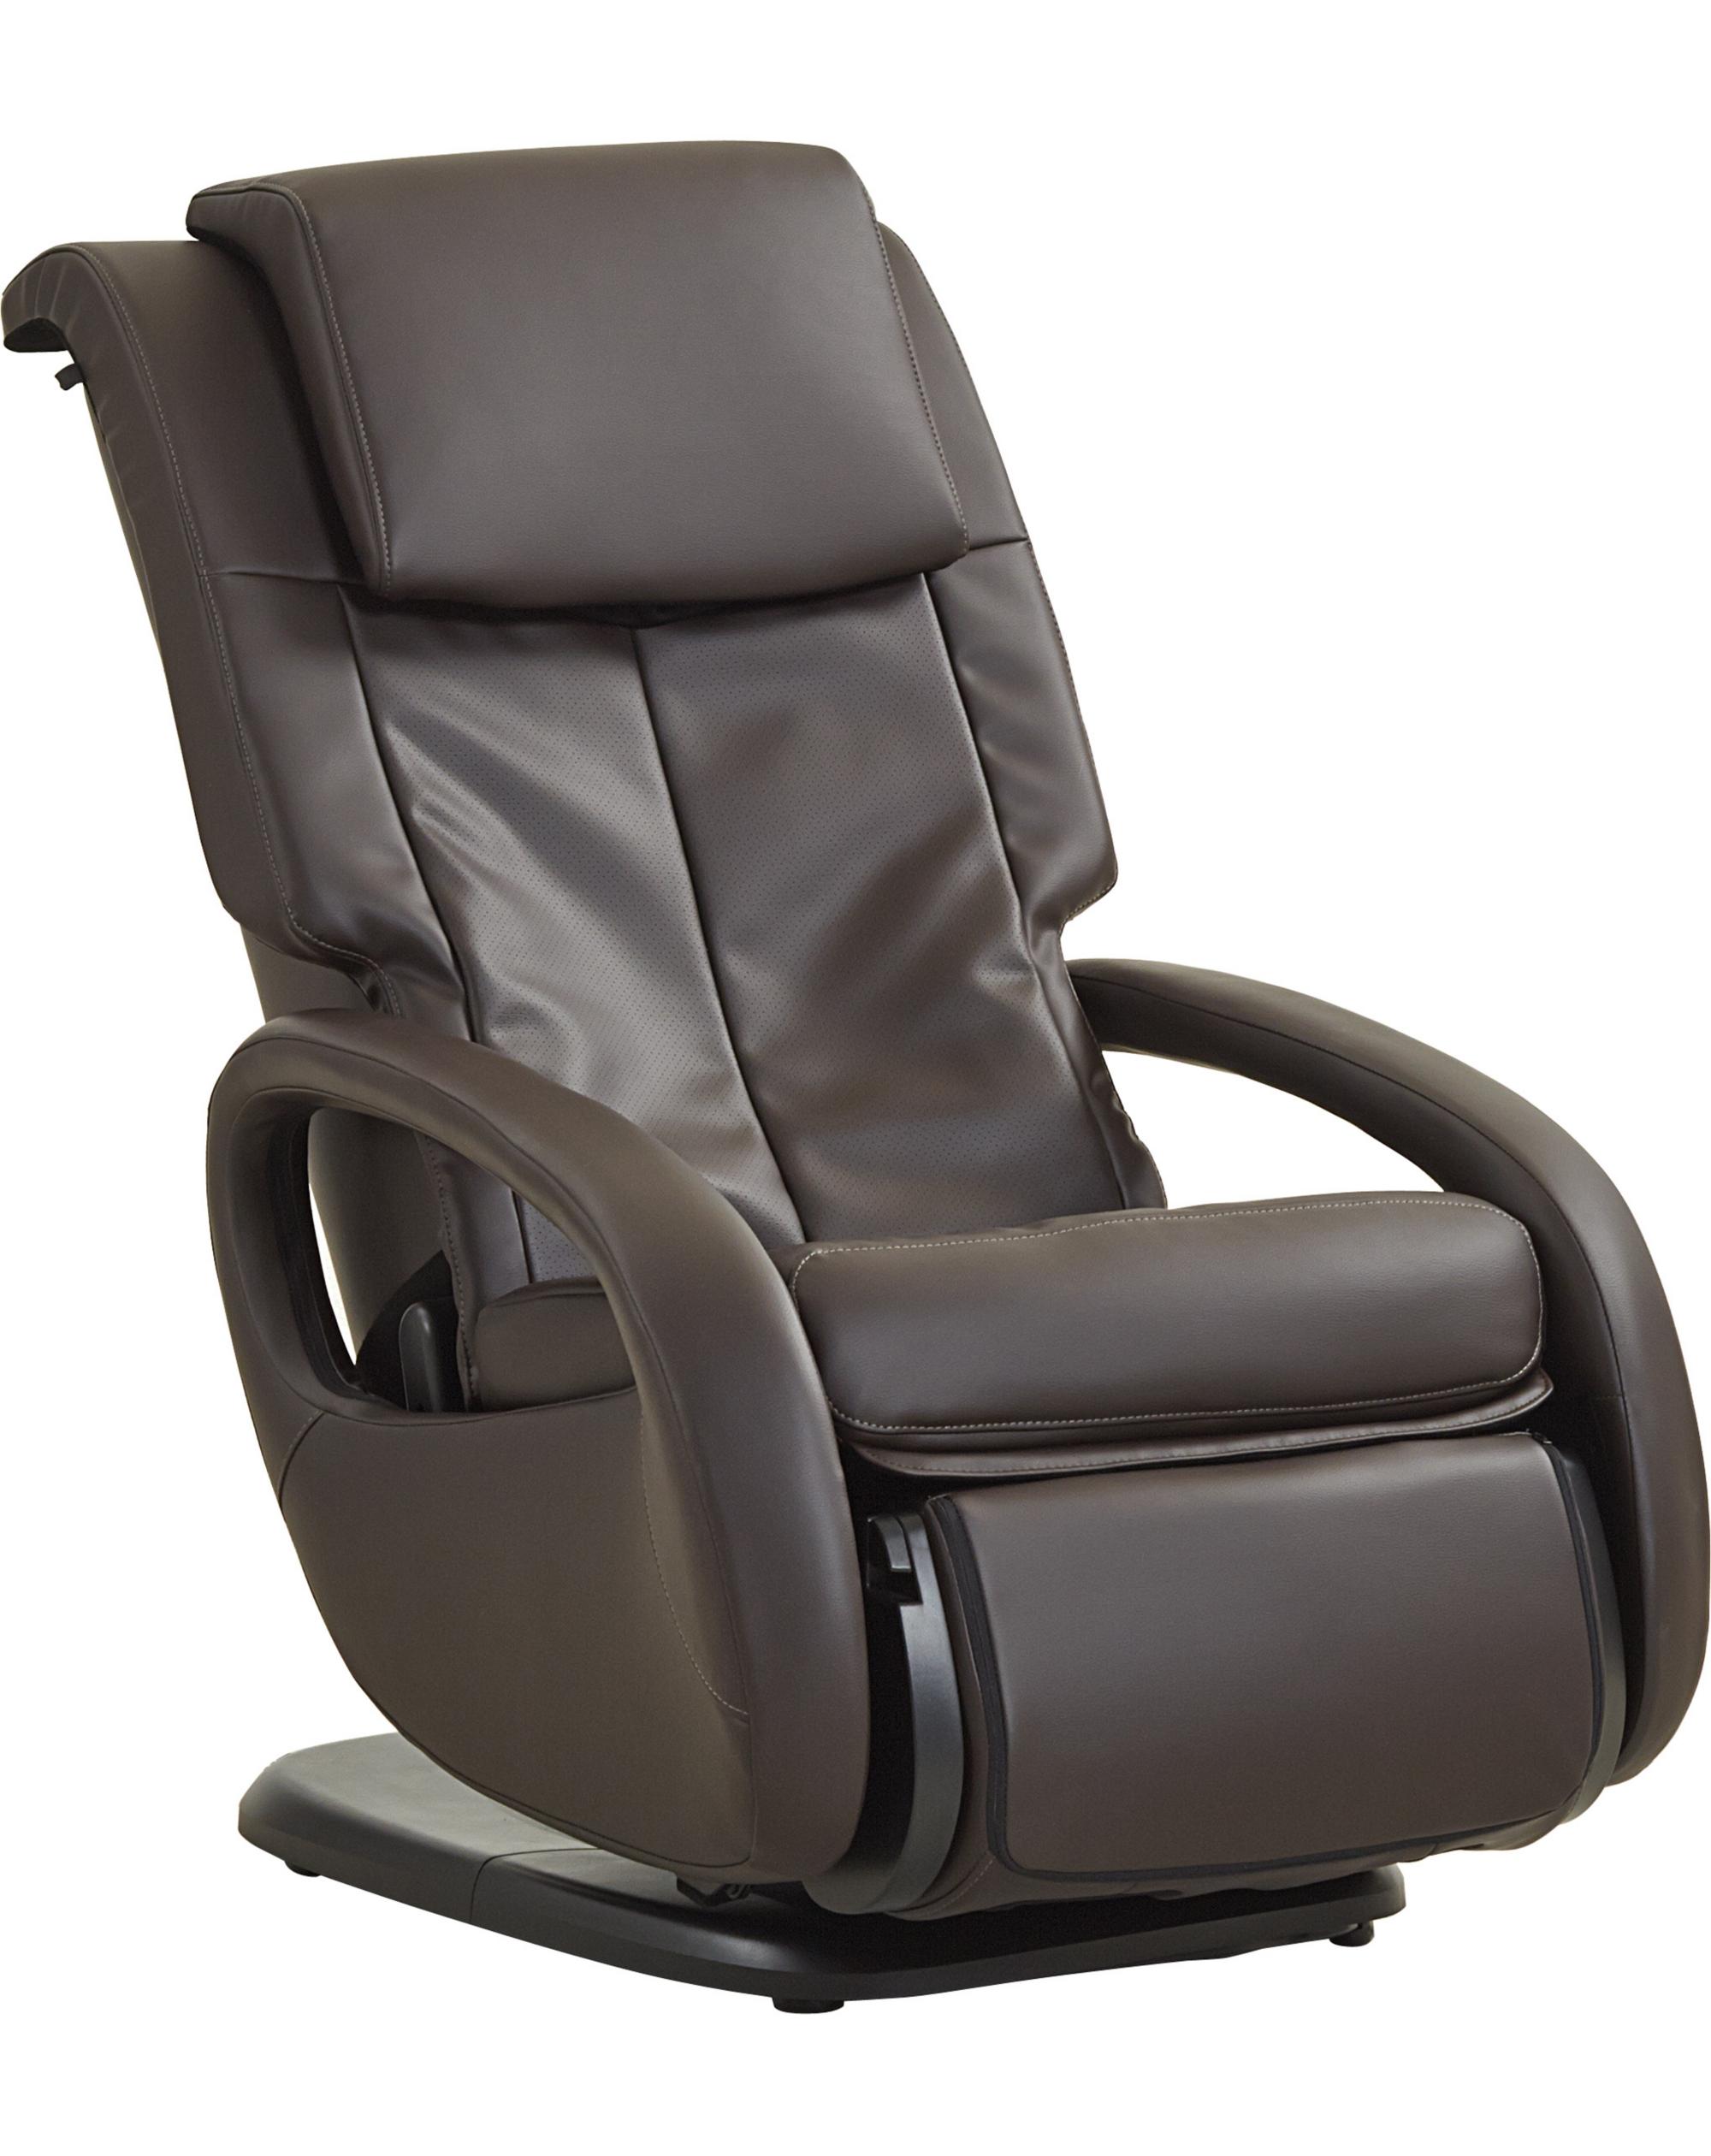 Human Touch WB71 Massage Chair Recliner